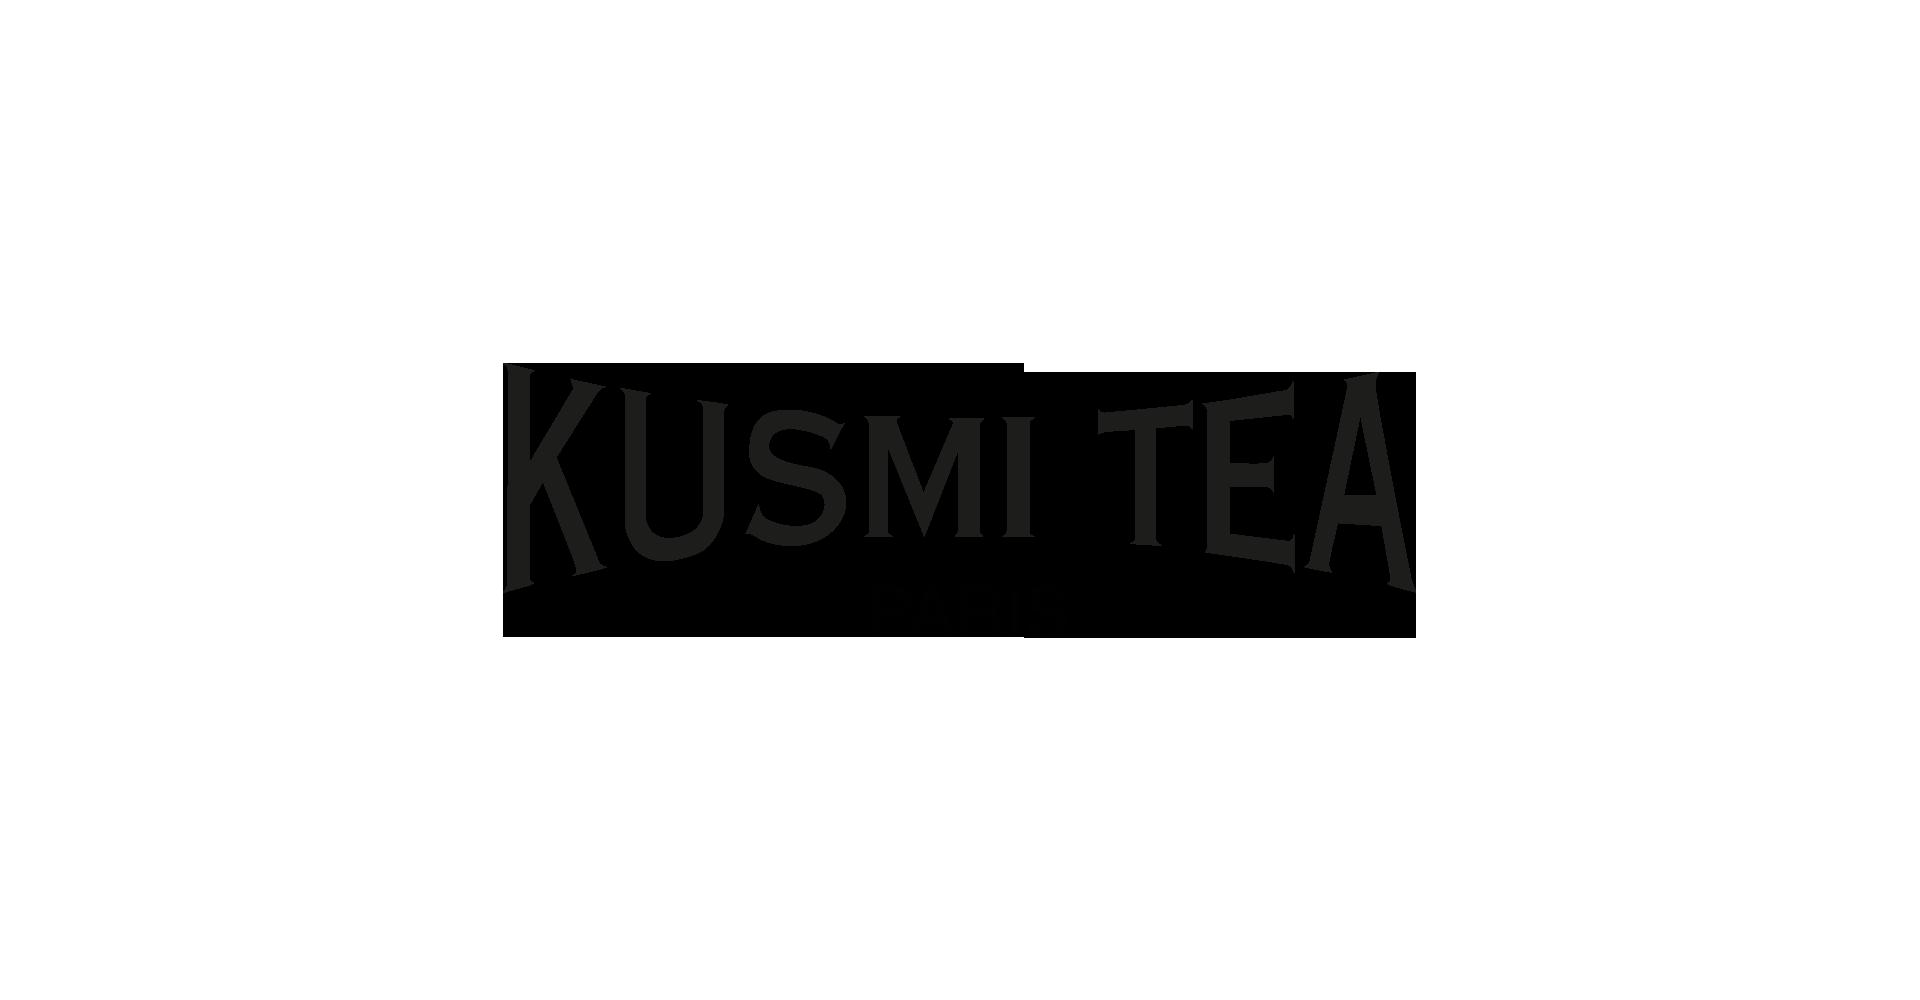 kusmi_logo